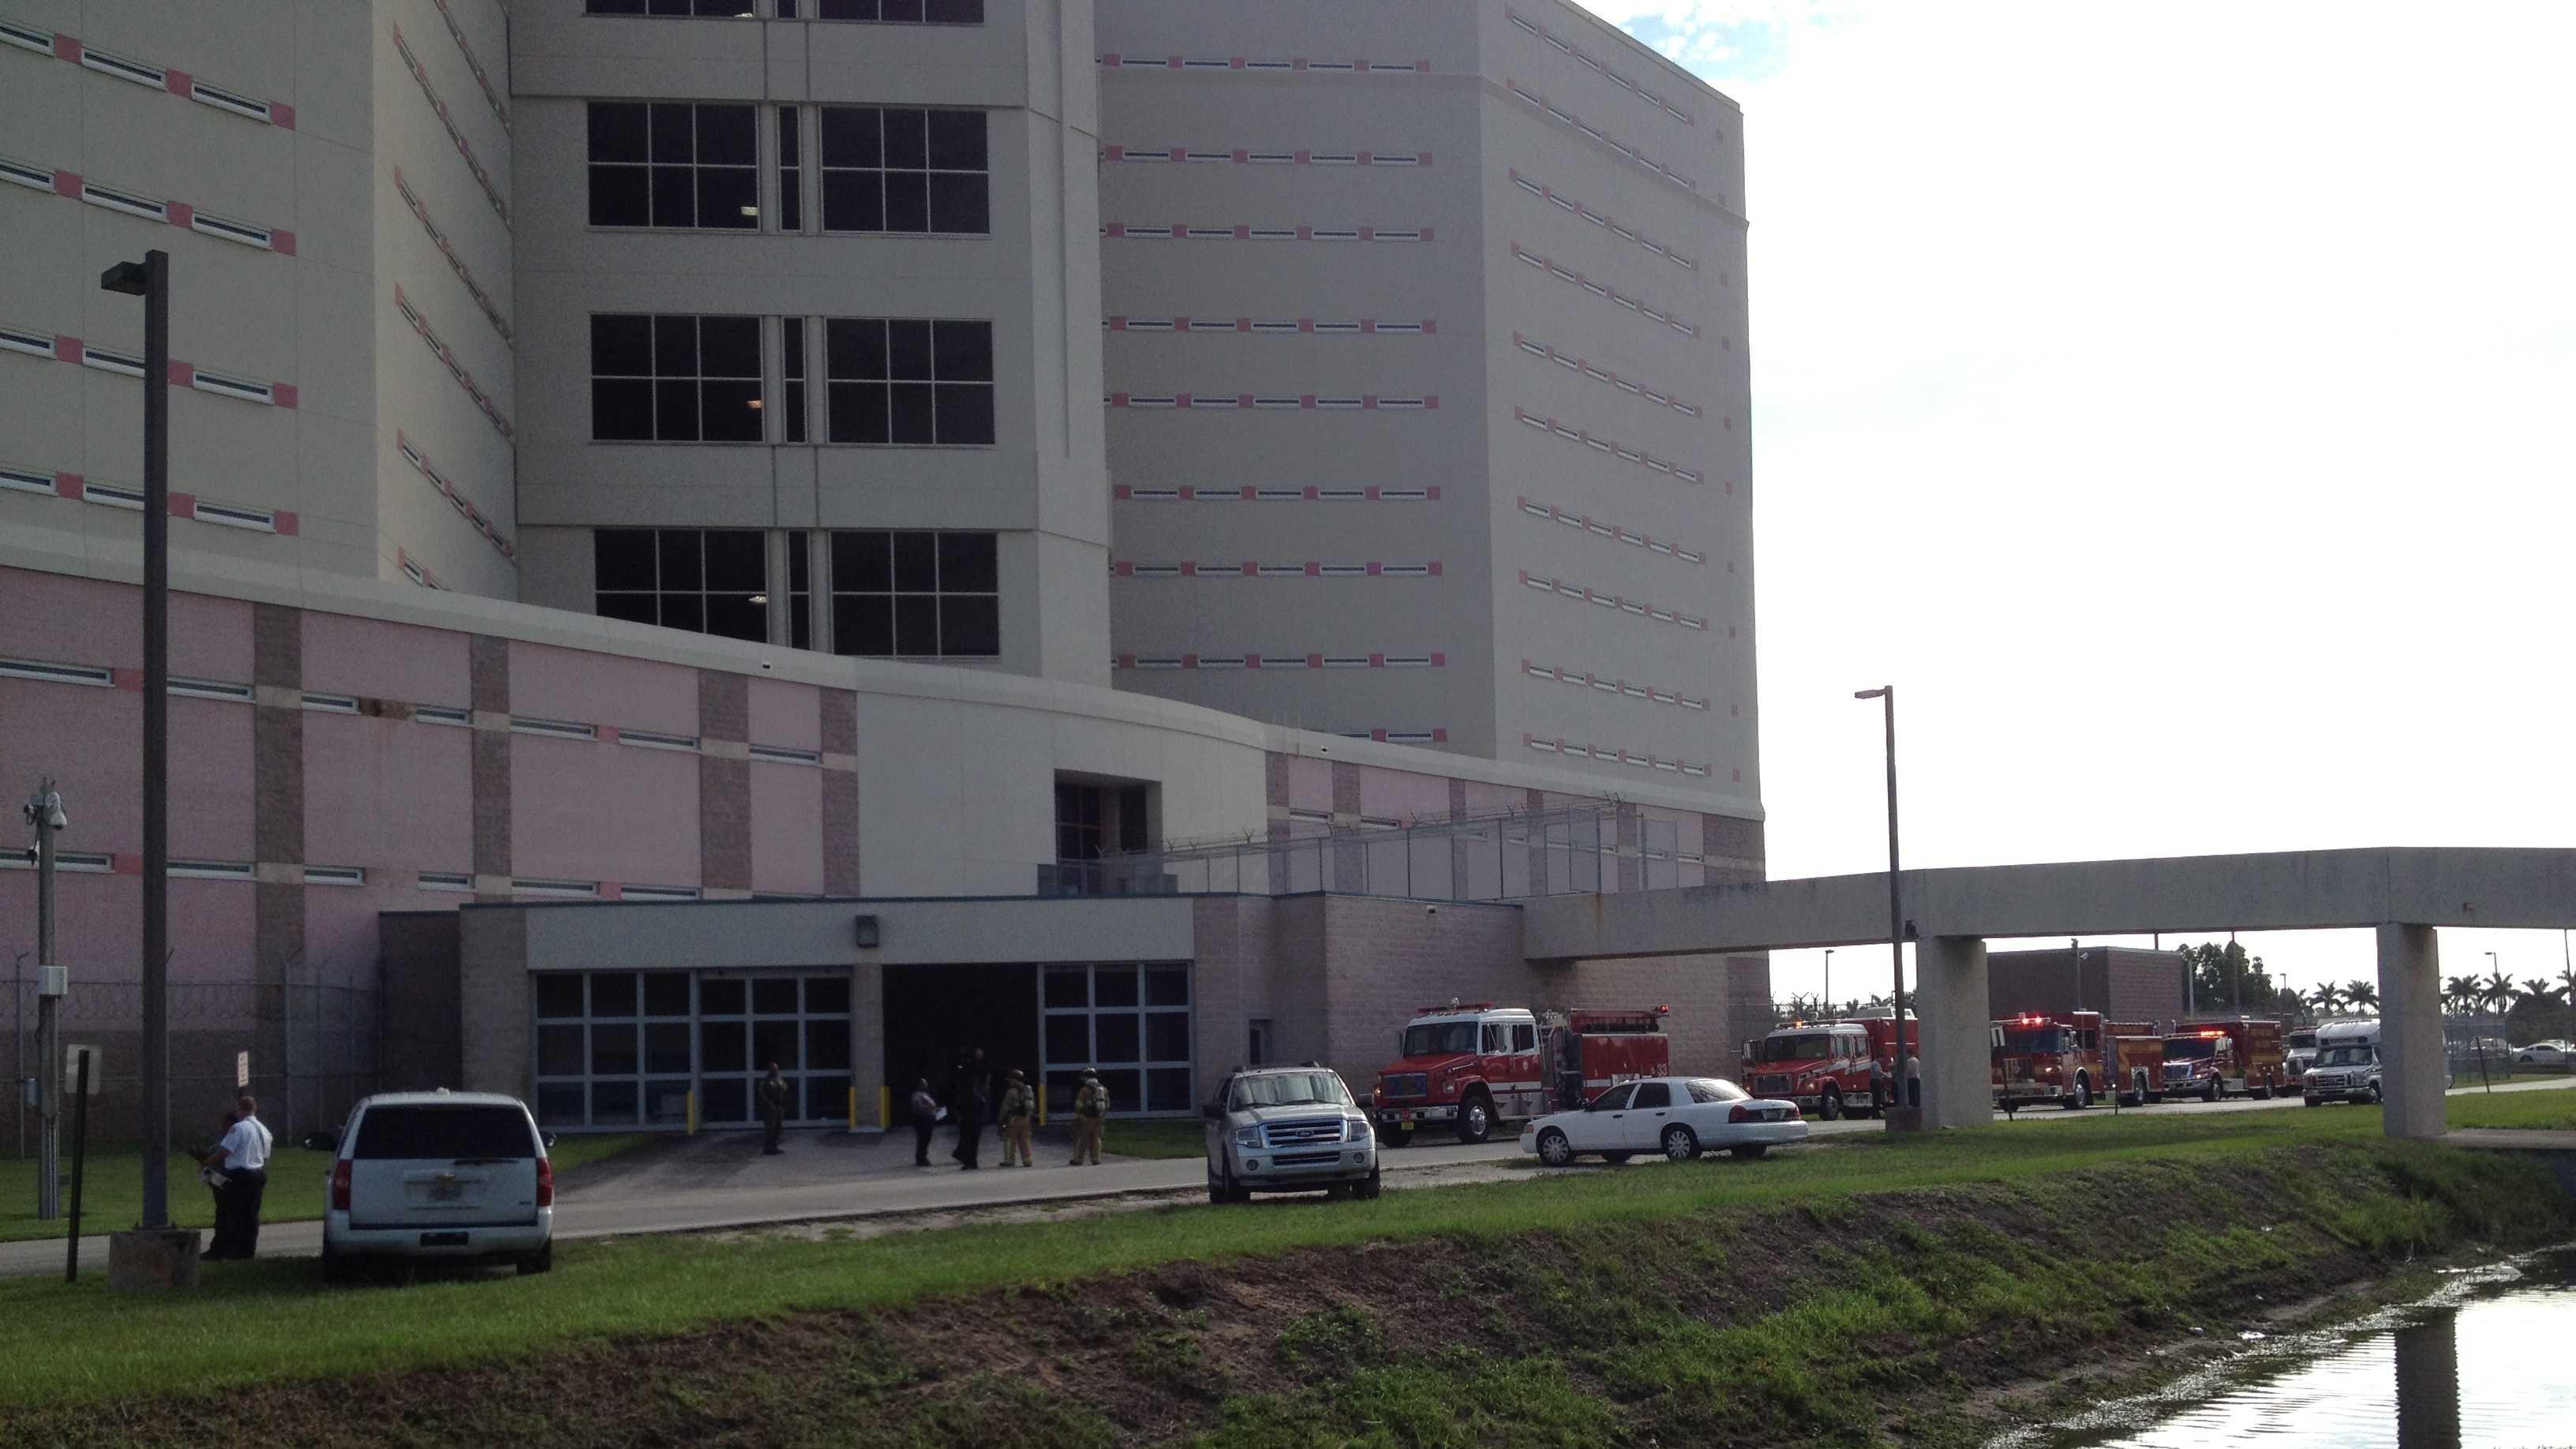 Palm Beach County Jail white powder scene